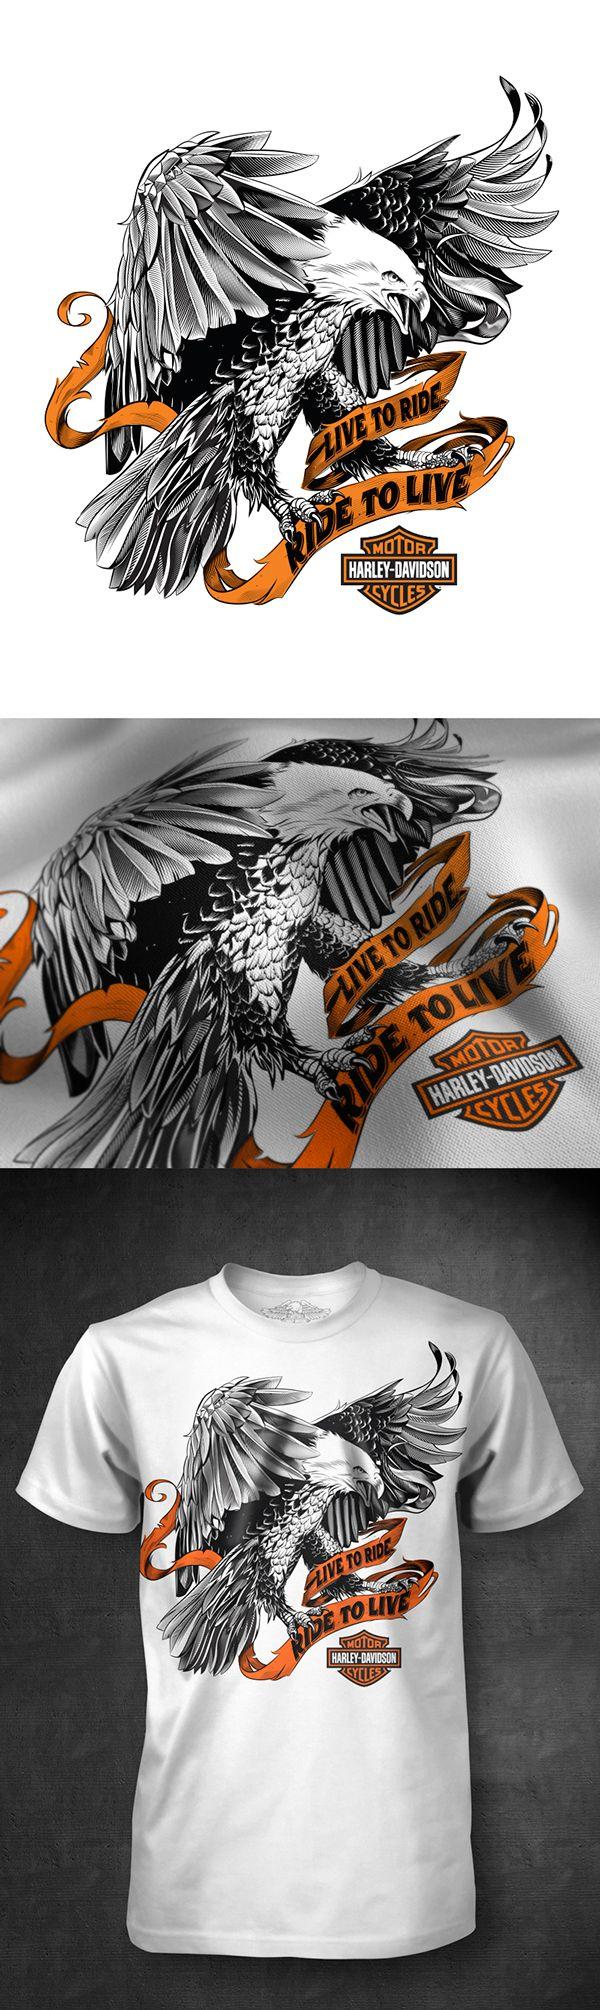 T-shirts designs for Harley Davidson. on Behance